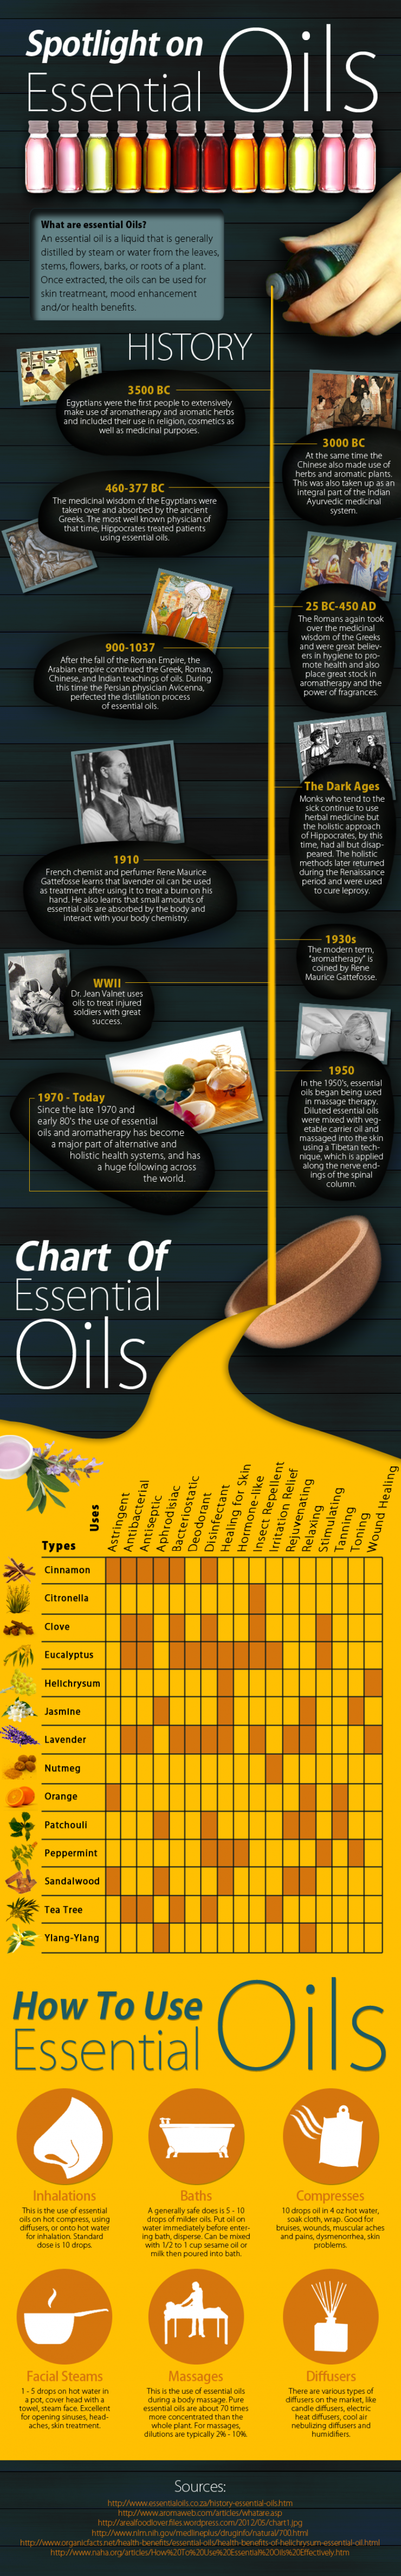 Spotlight on Essential Oils